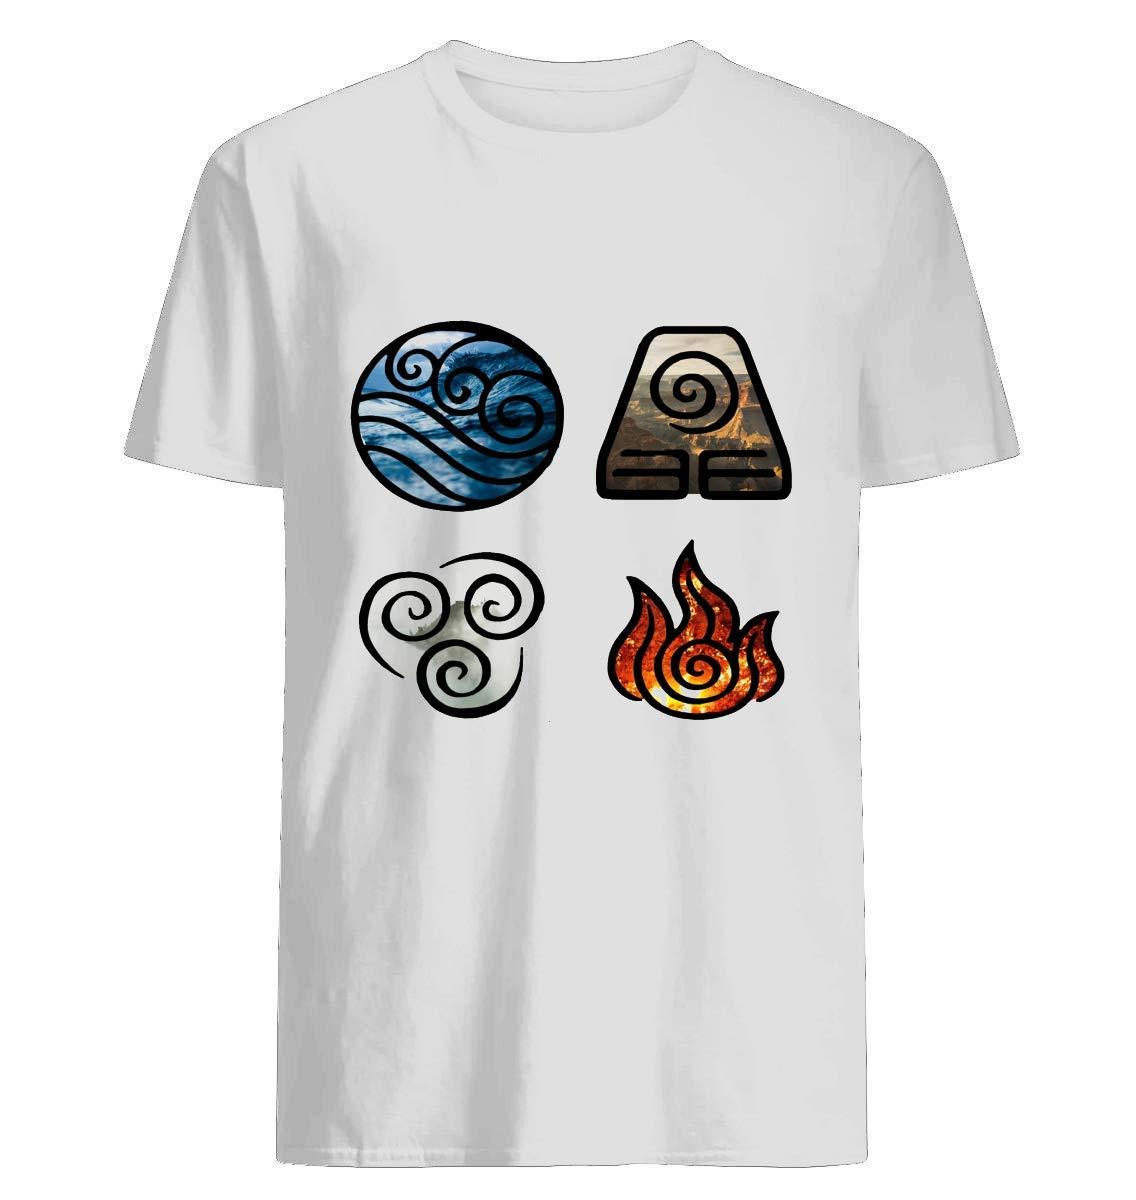 Avatar The Last Airbender Elet Symbols T Shirt For Unisex